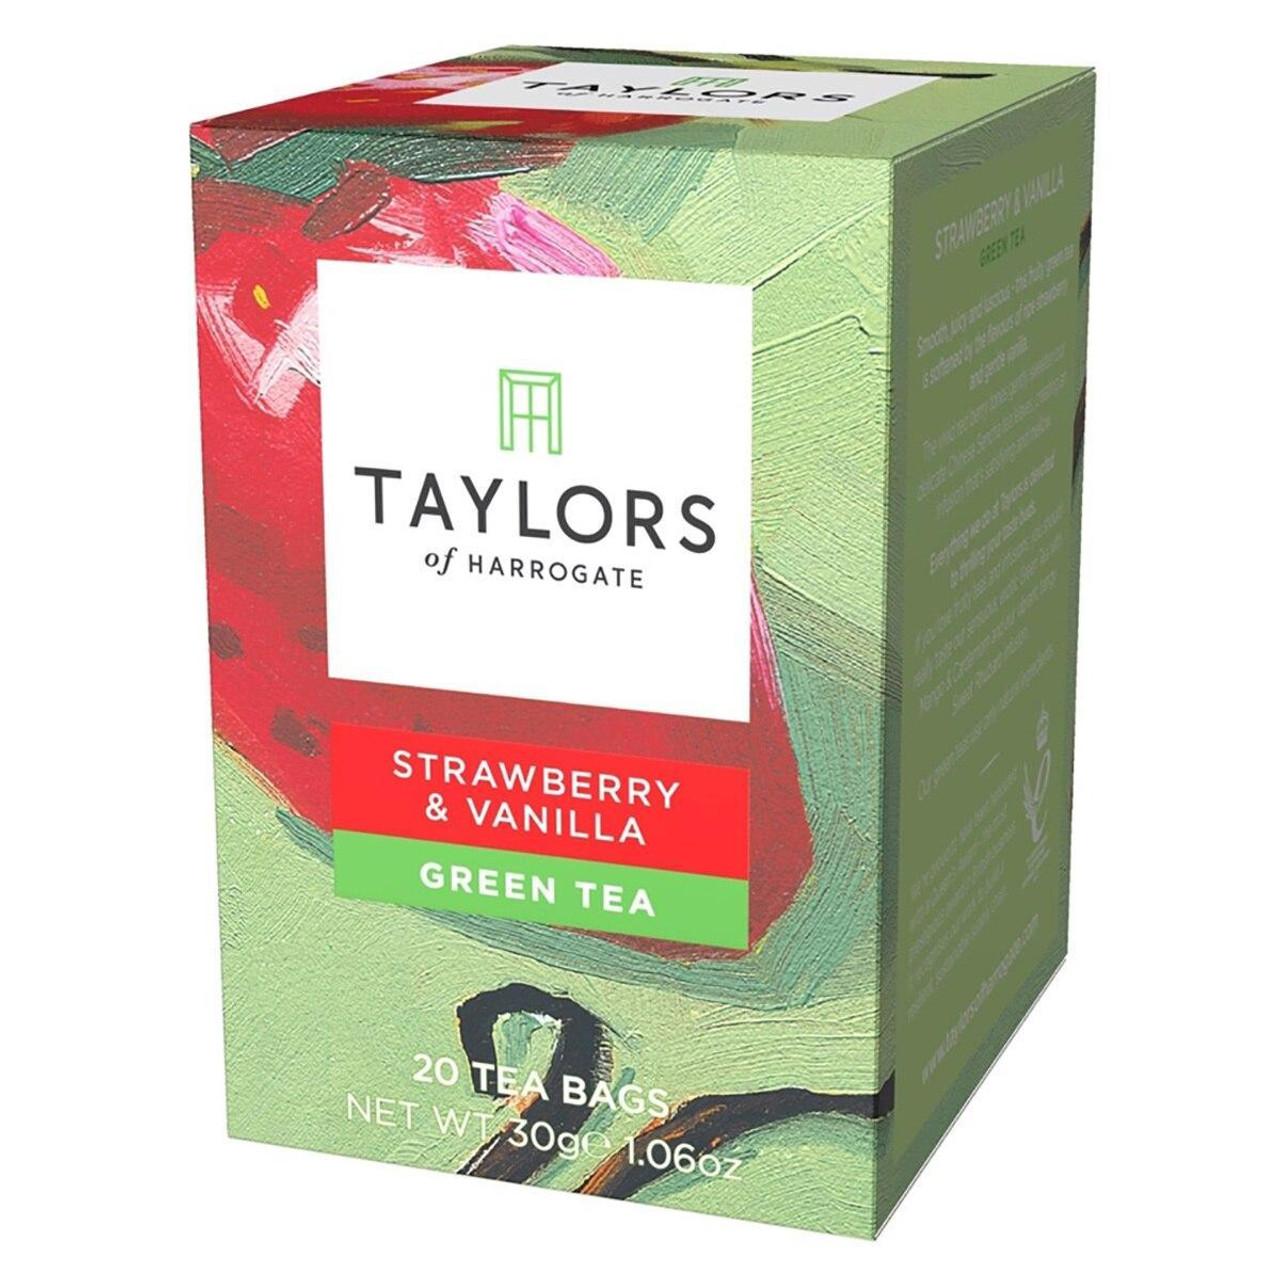 Taylors of Harrogate - Strawberry & Vanilla Green Tea - 20 Wrapped Tea Bags